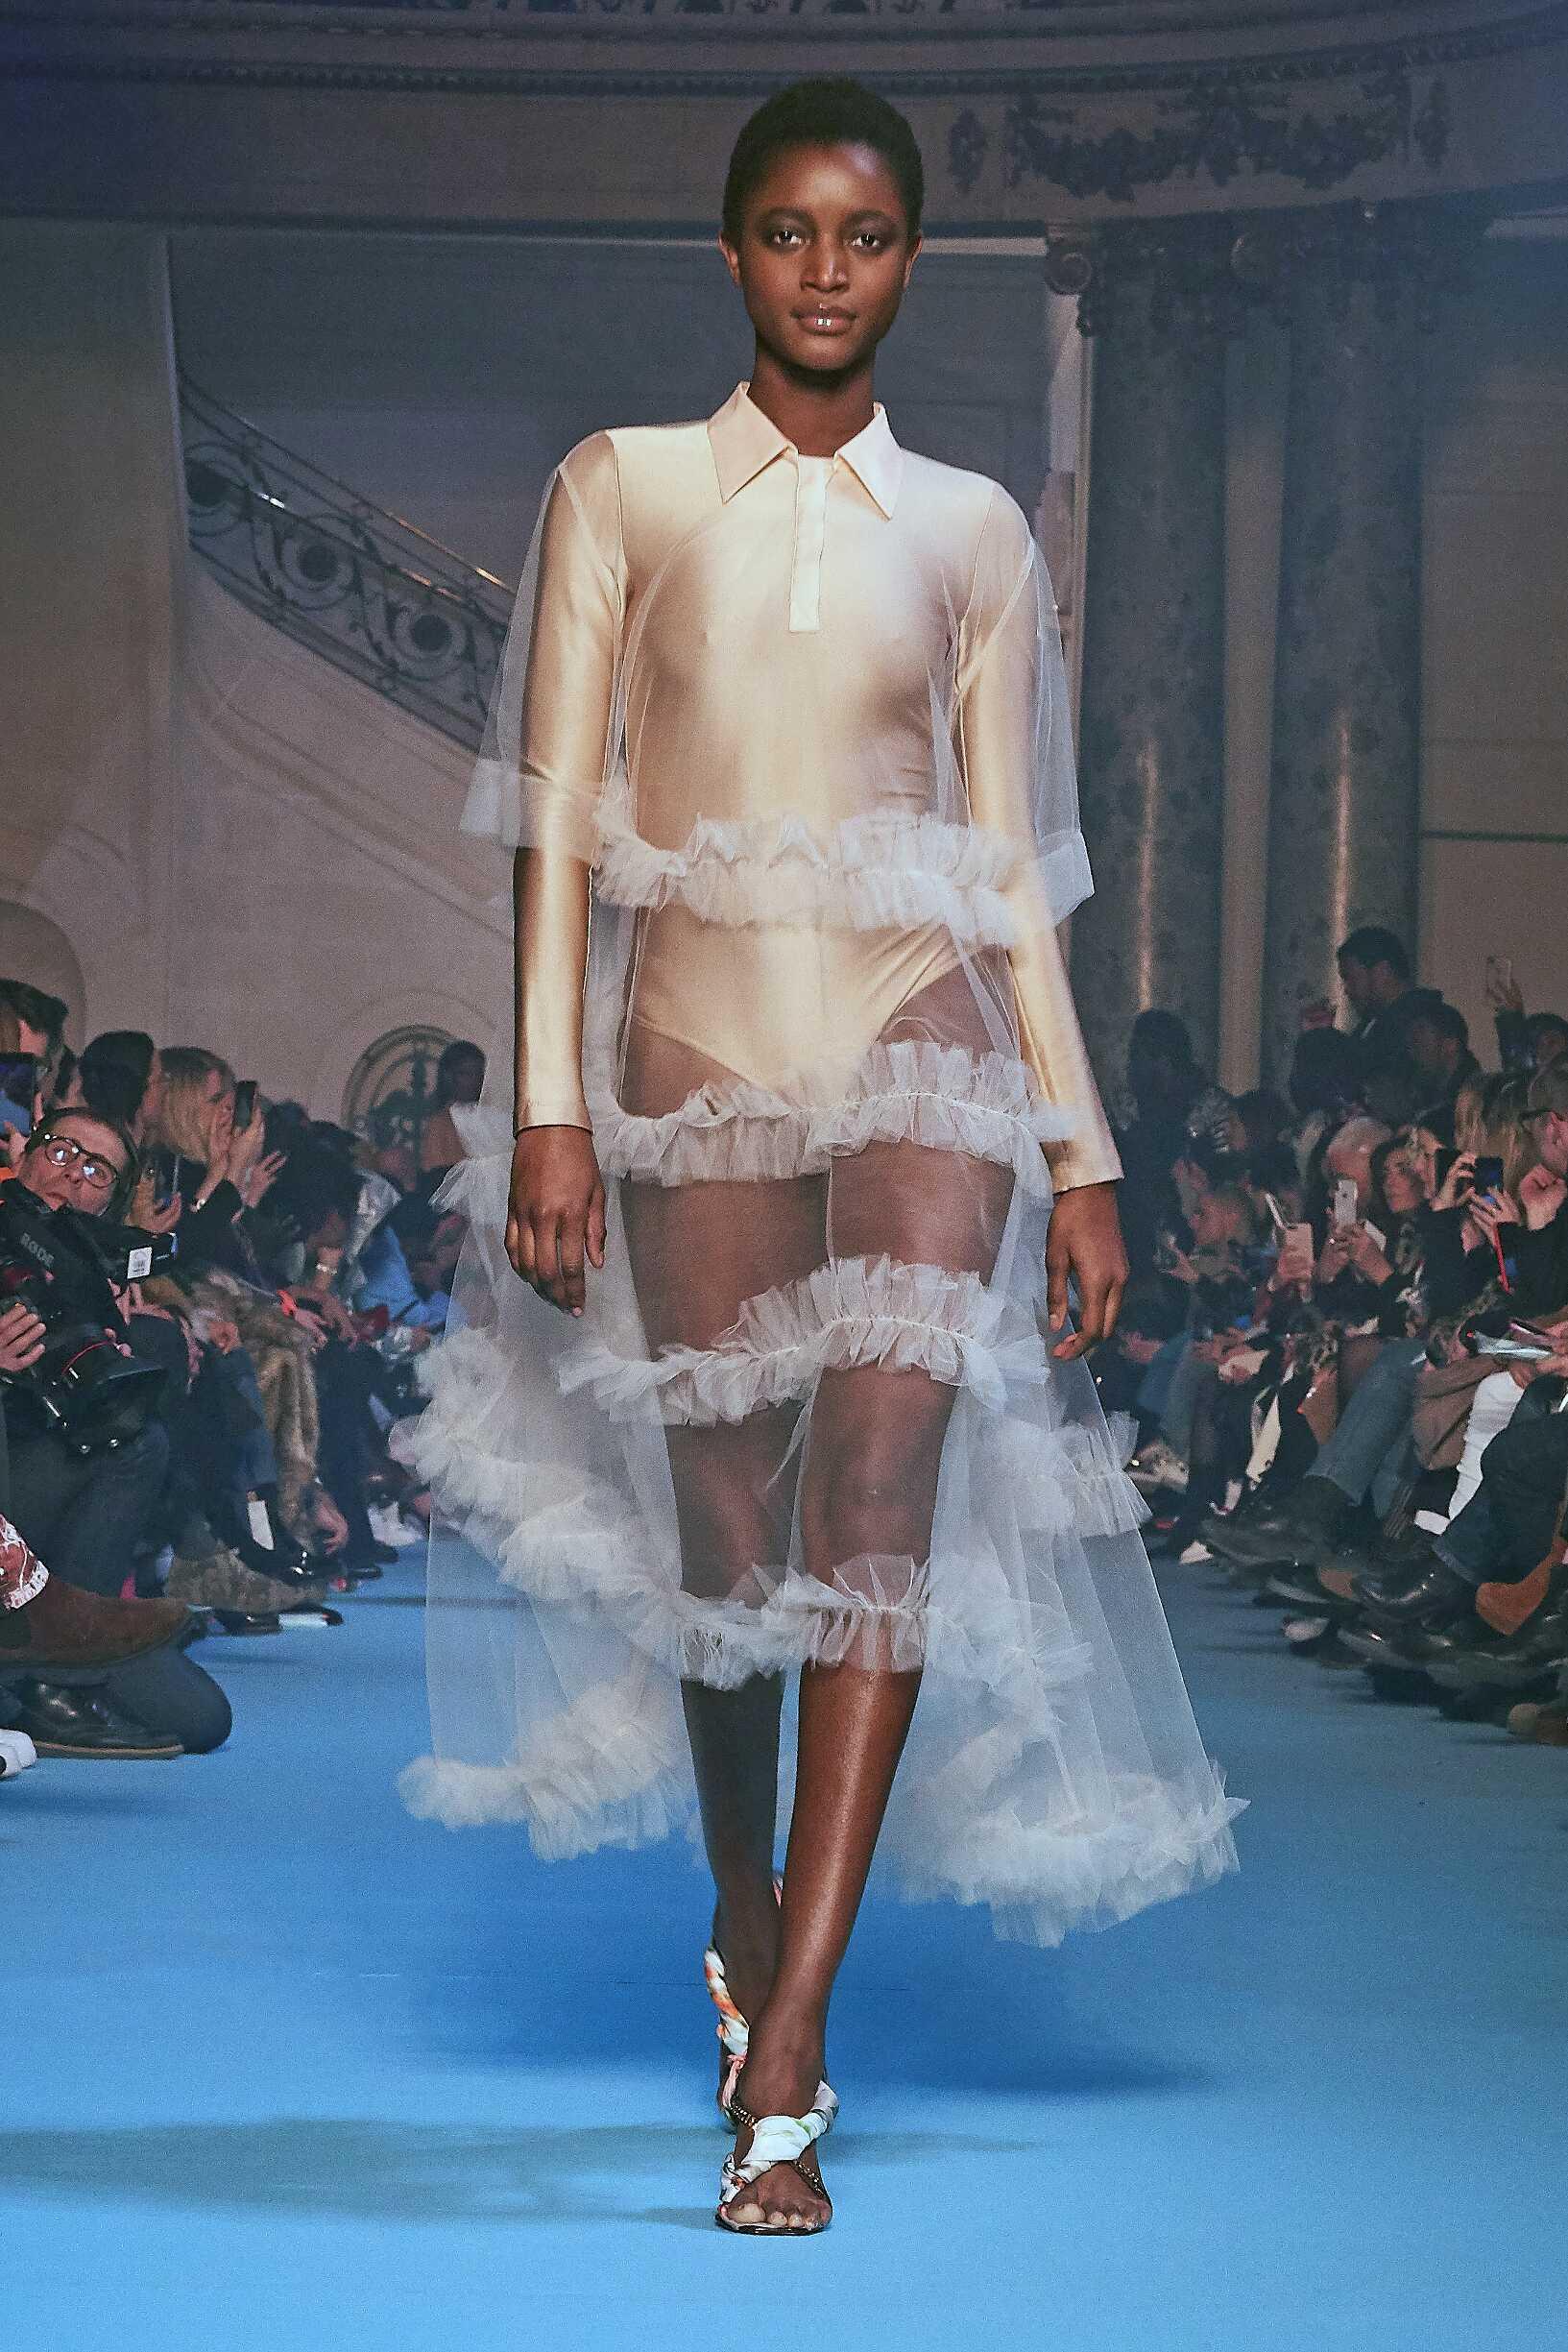 Womenswear Runway Fashion Show Off-White